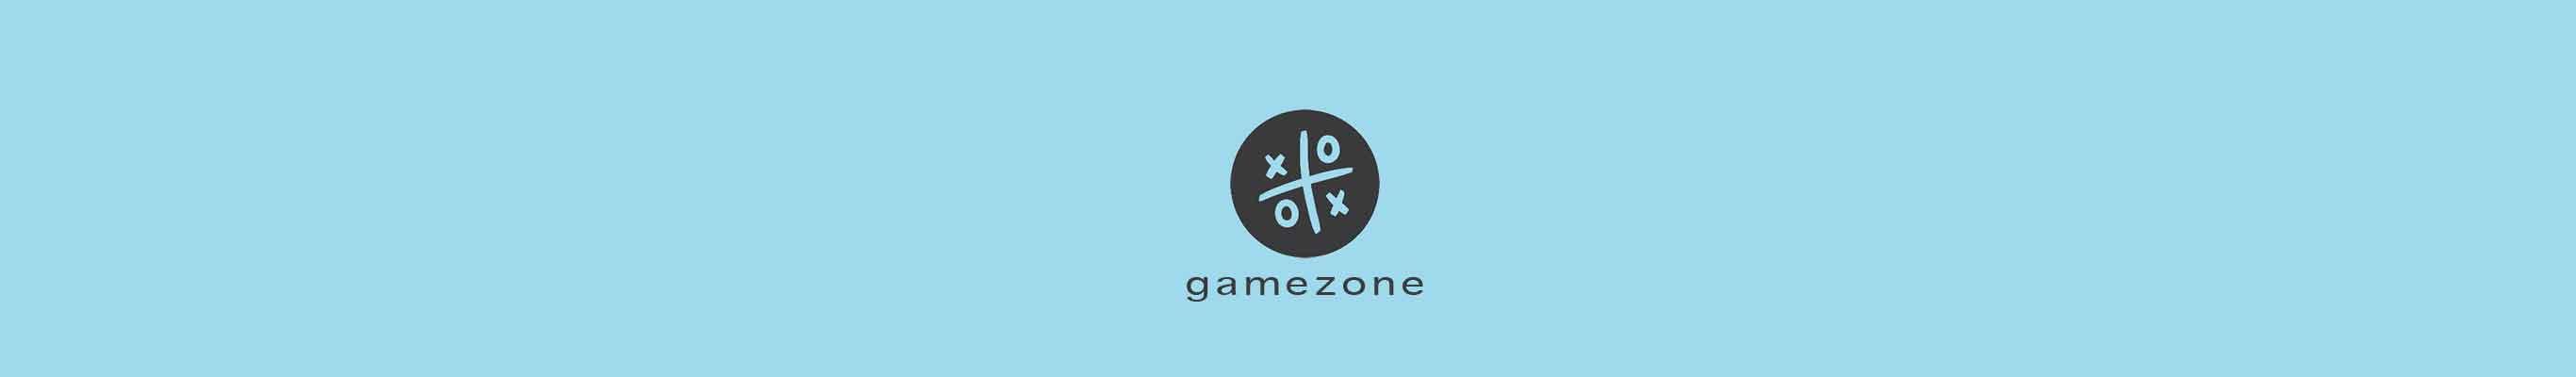 gamezone1